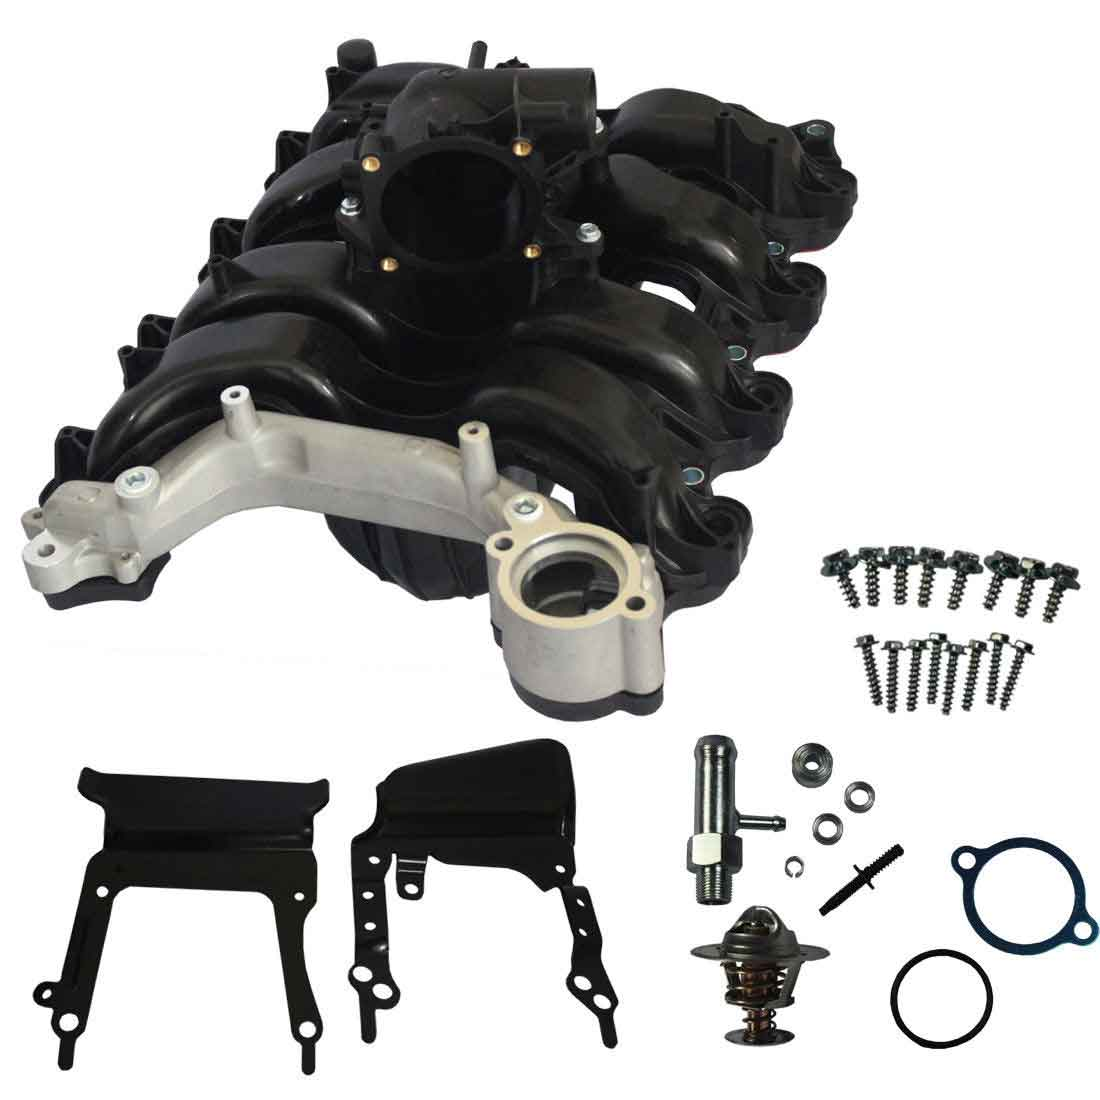 Throttle Position Sensor Jeep Patriot: THROTTLE BODY JEEP DODGE Chrysler 1.8L 2.0L Caliber